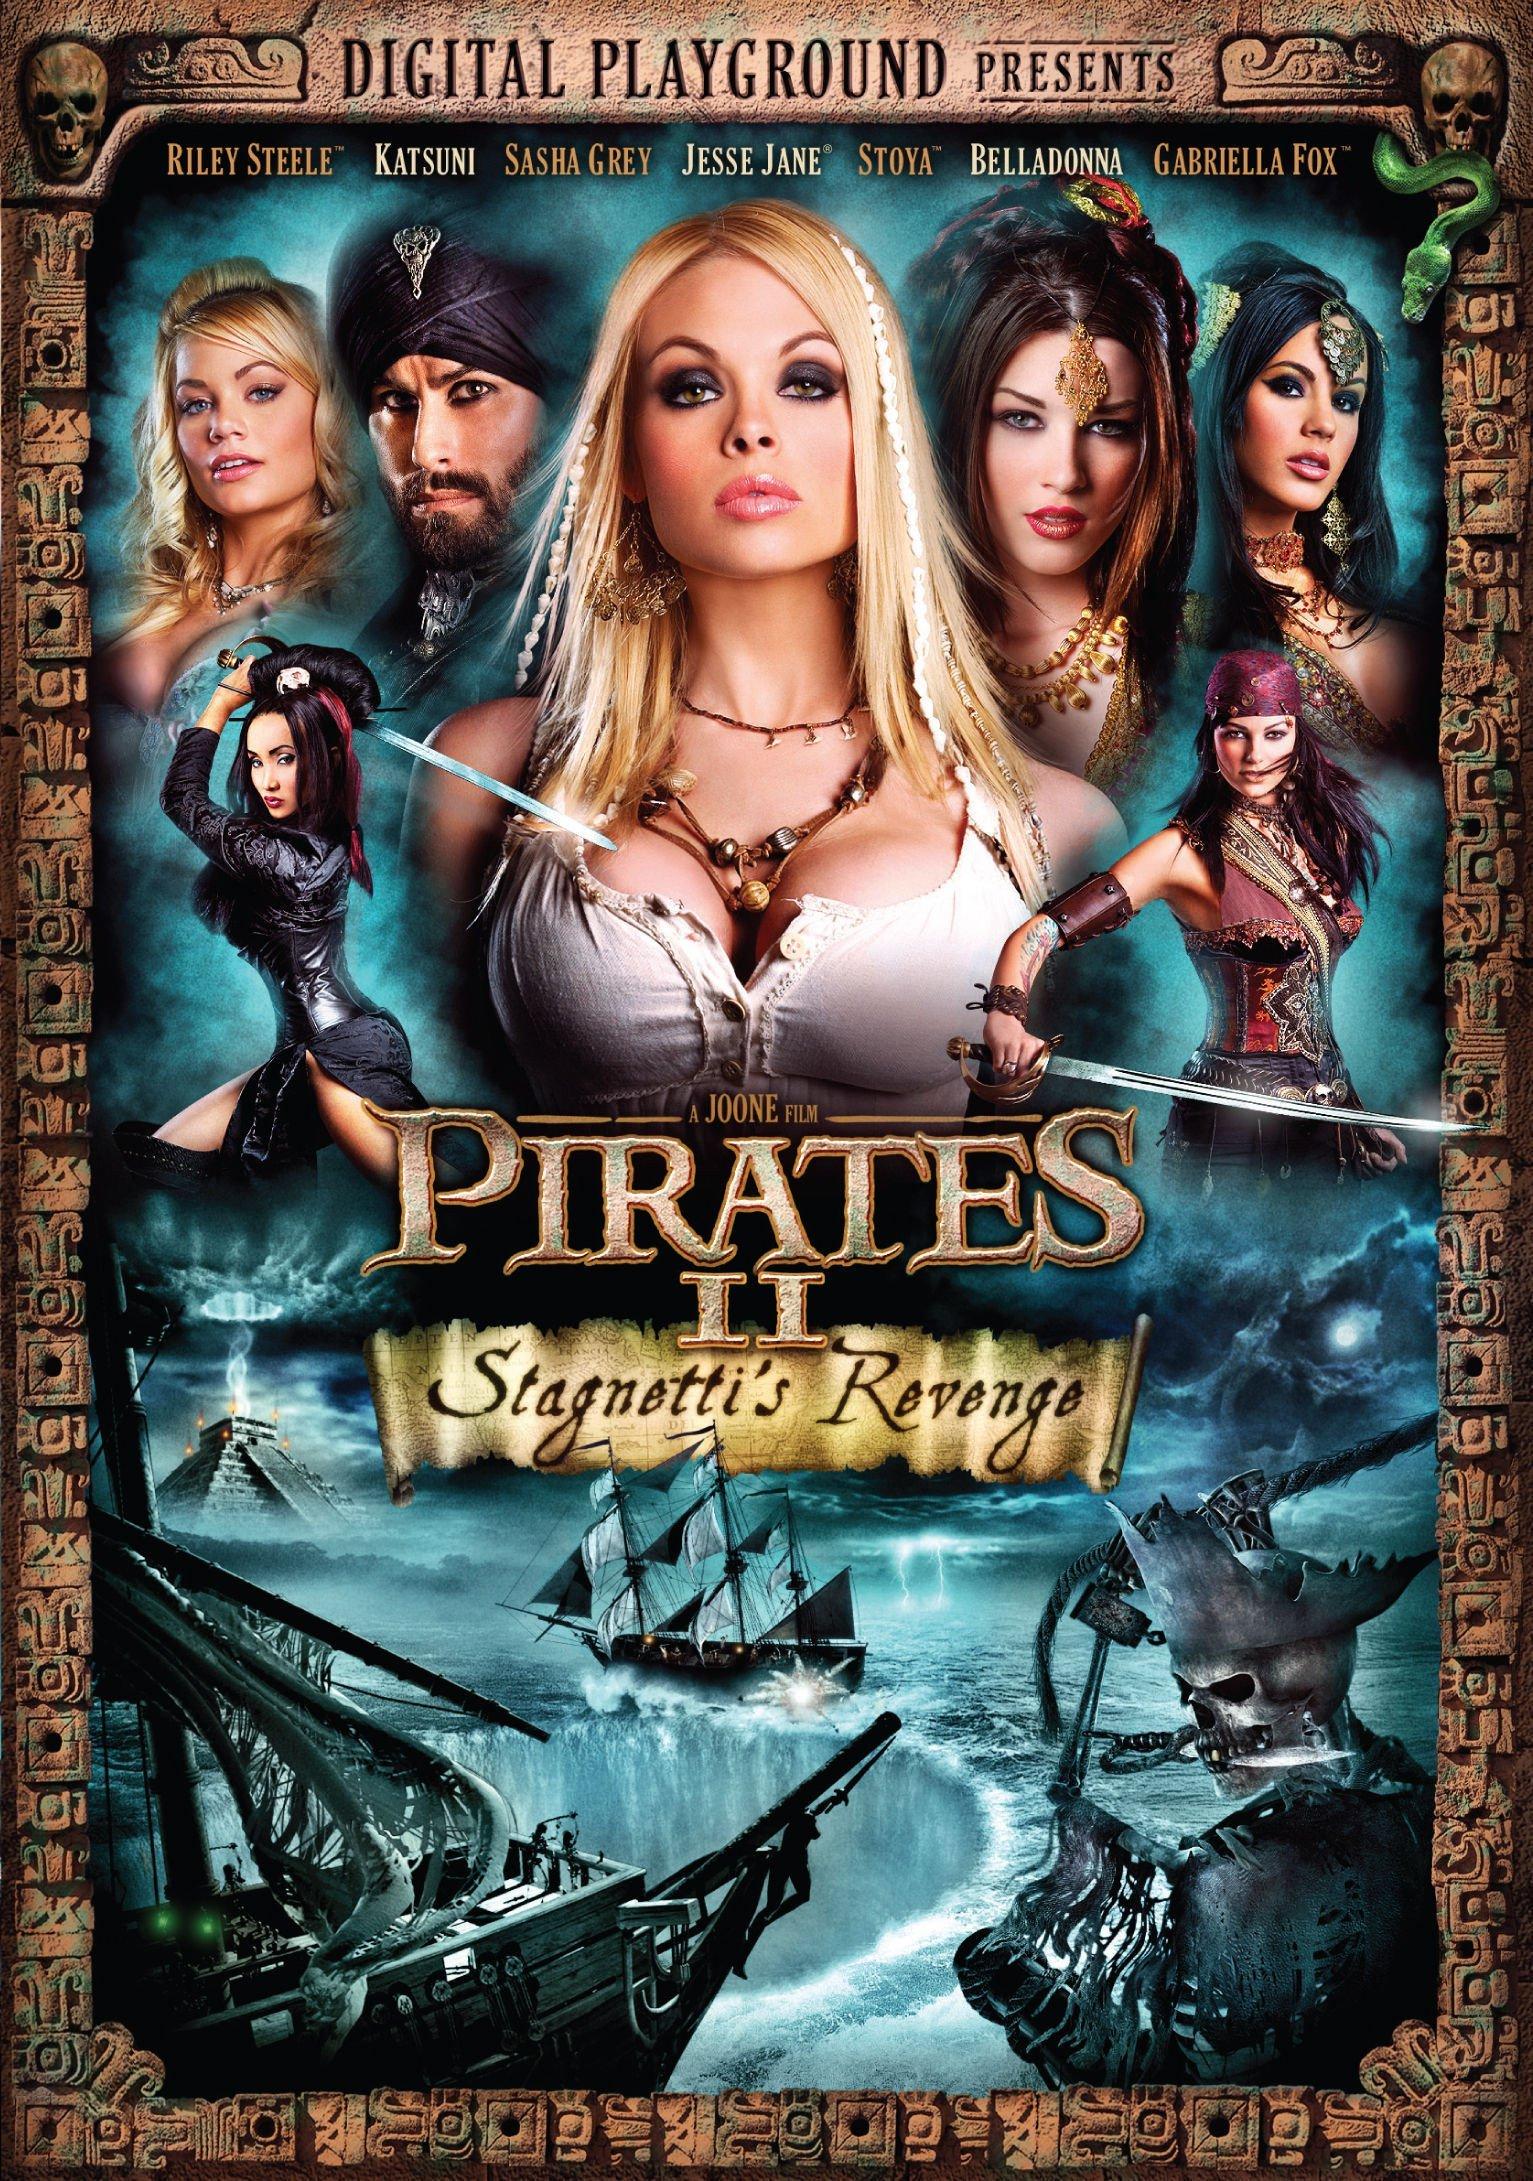 Pirates II: Stagnettis Revenge (2008) - Commedia